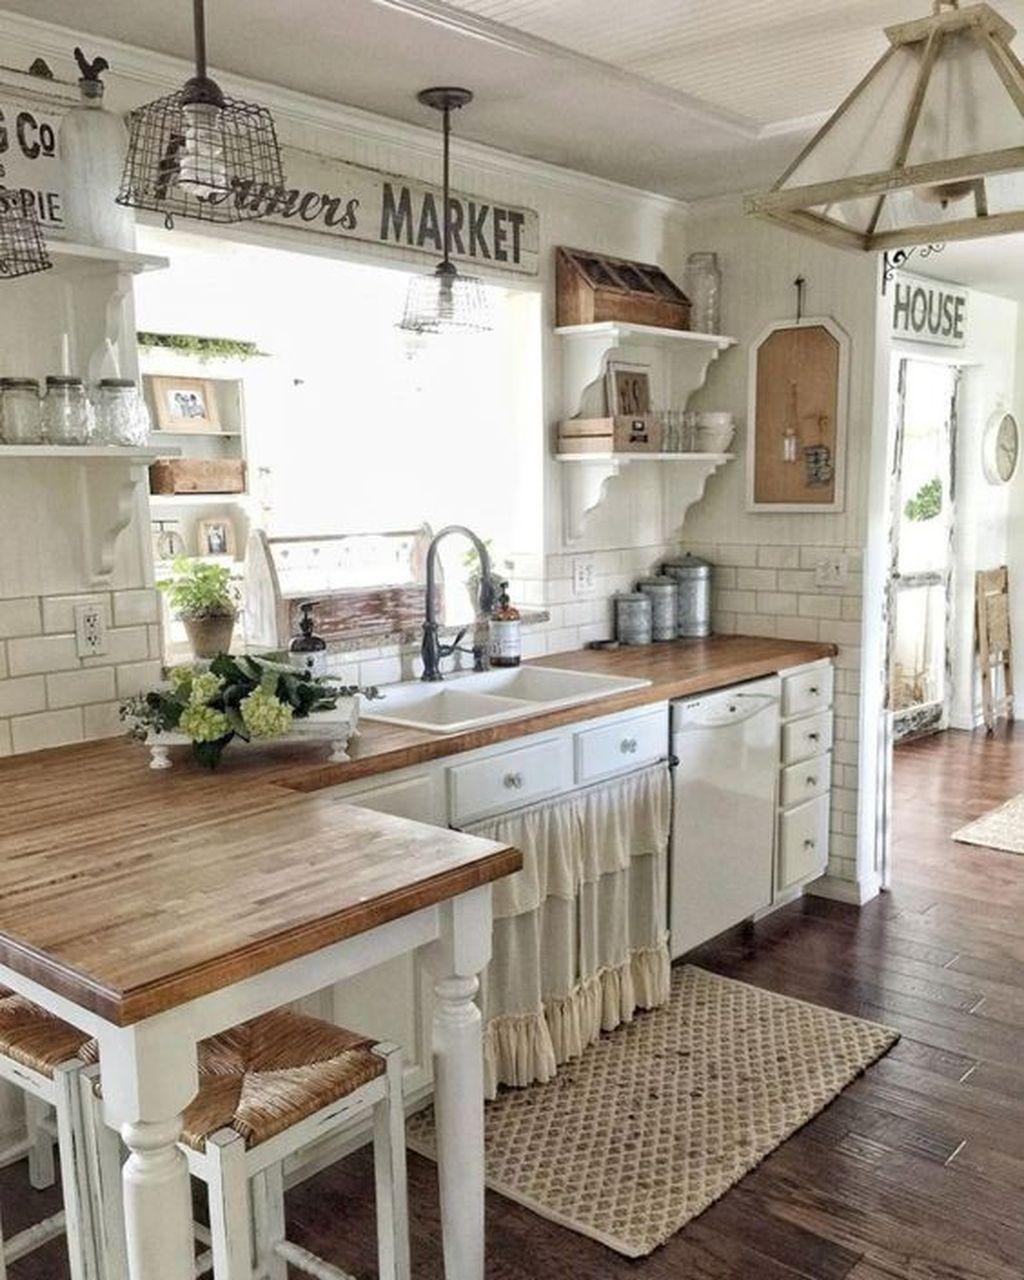 Long kitchen tables  Pin by Kika Ermel on Decoração de ambientes  Pinterest  Farmhouse